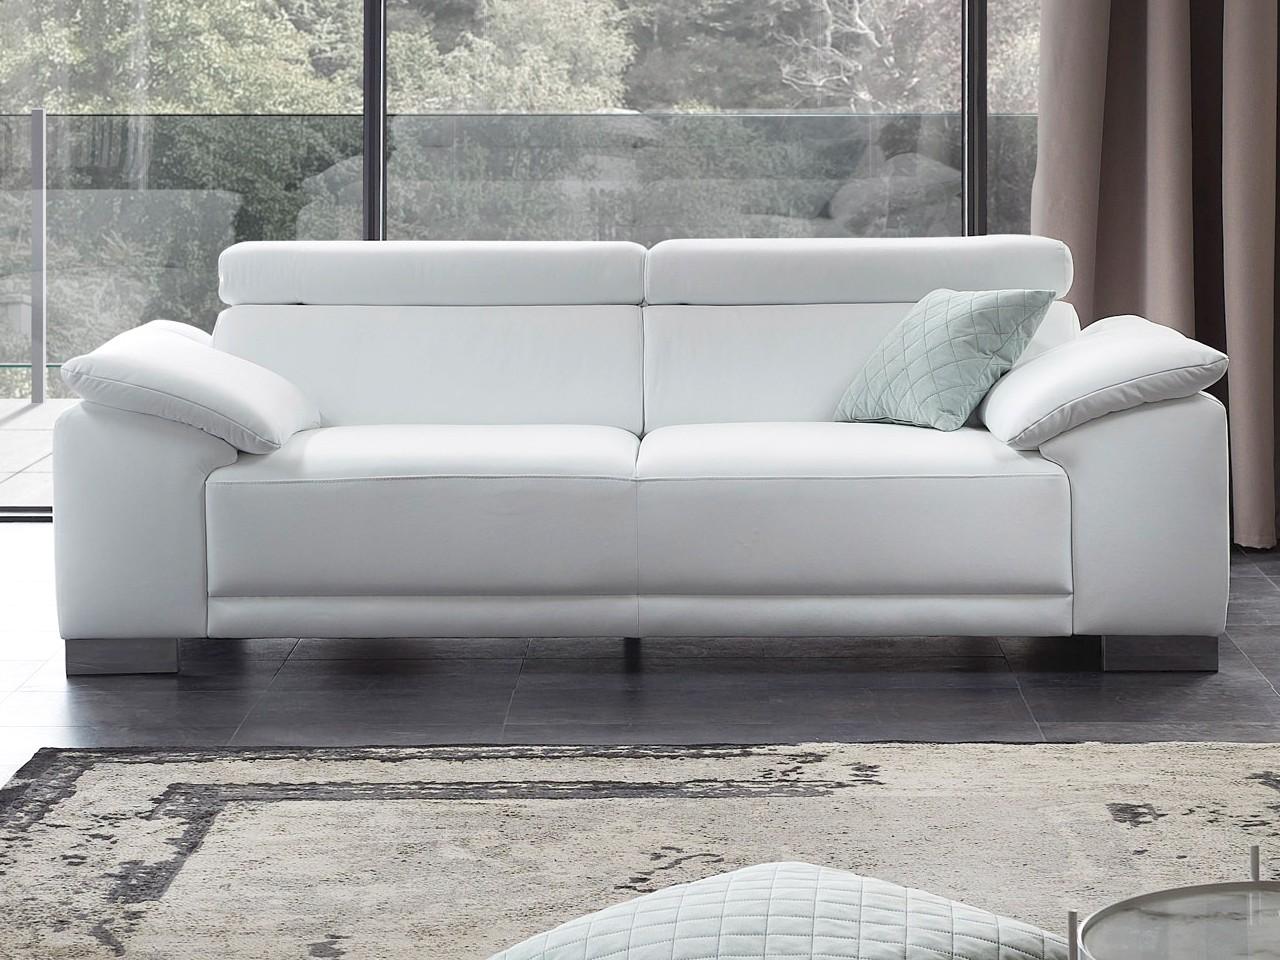 Antonio 2-Sitzer Sofa